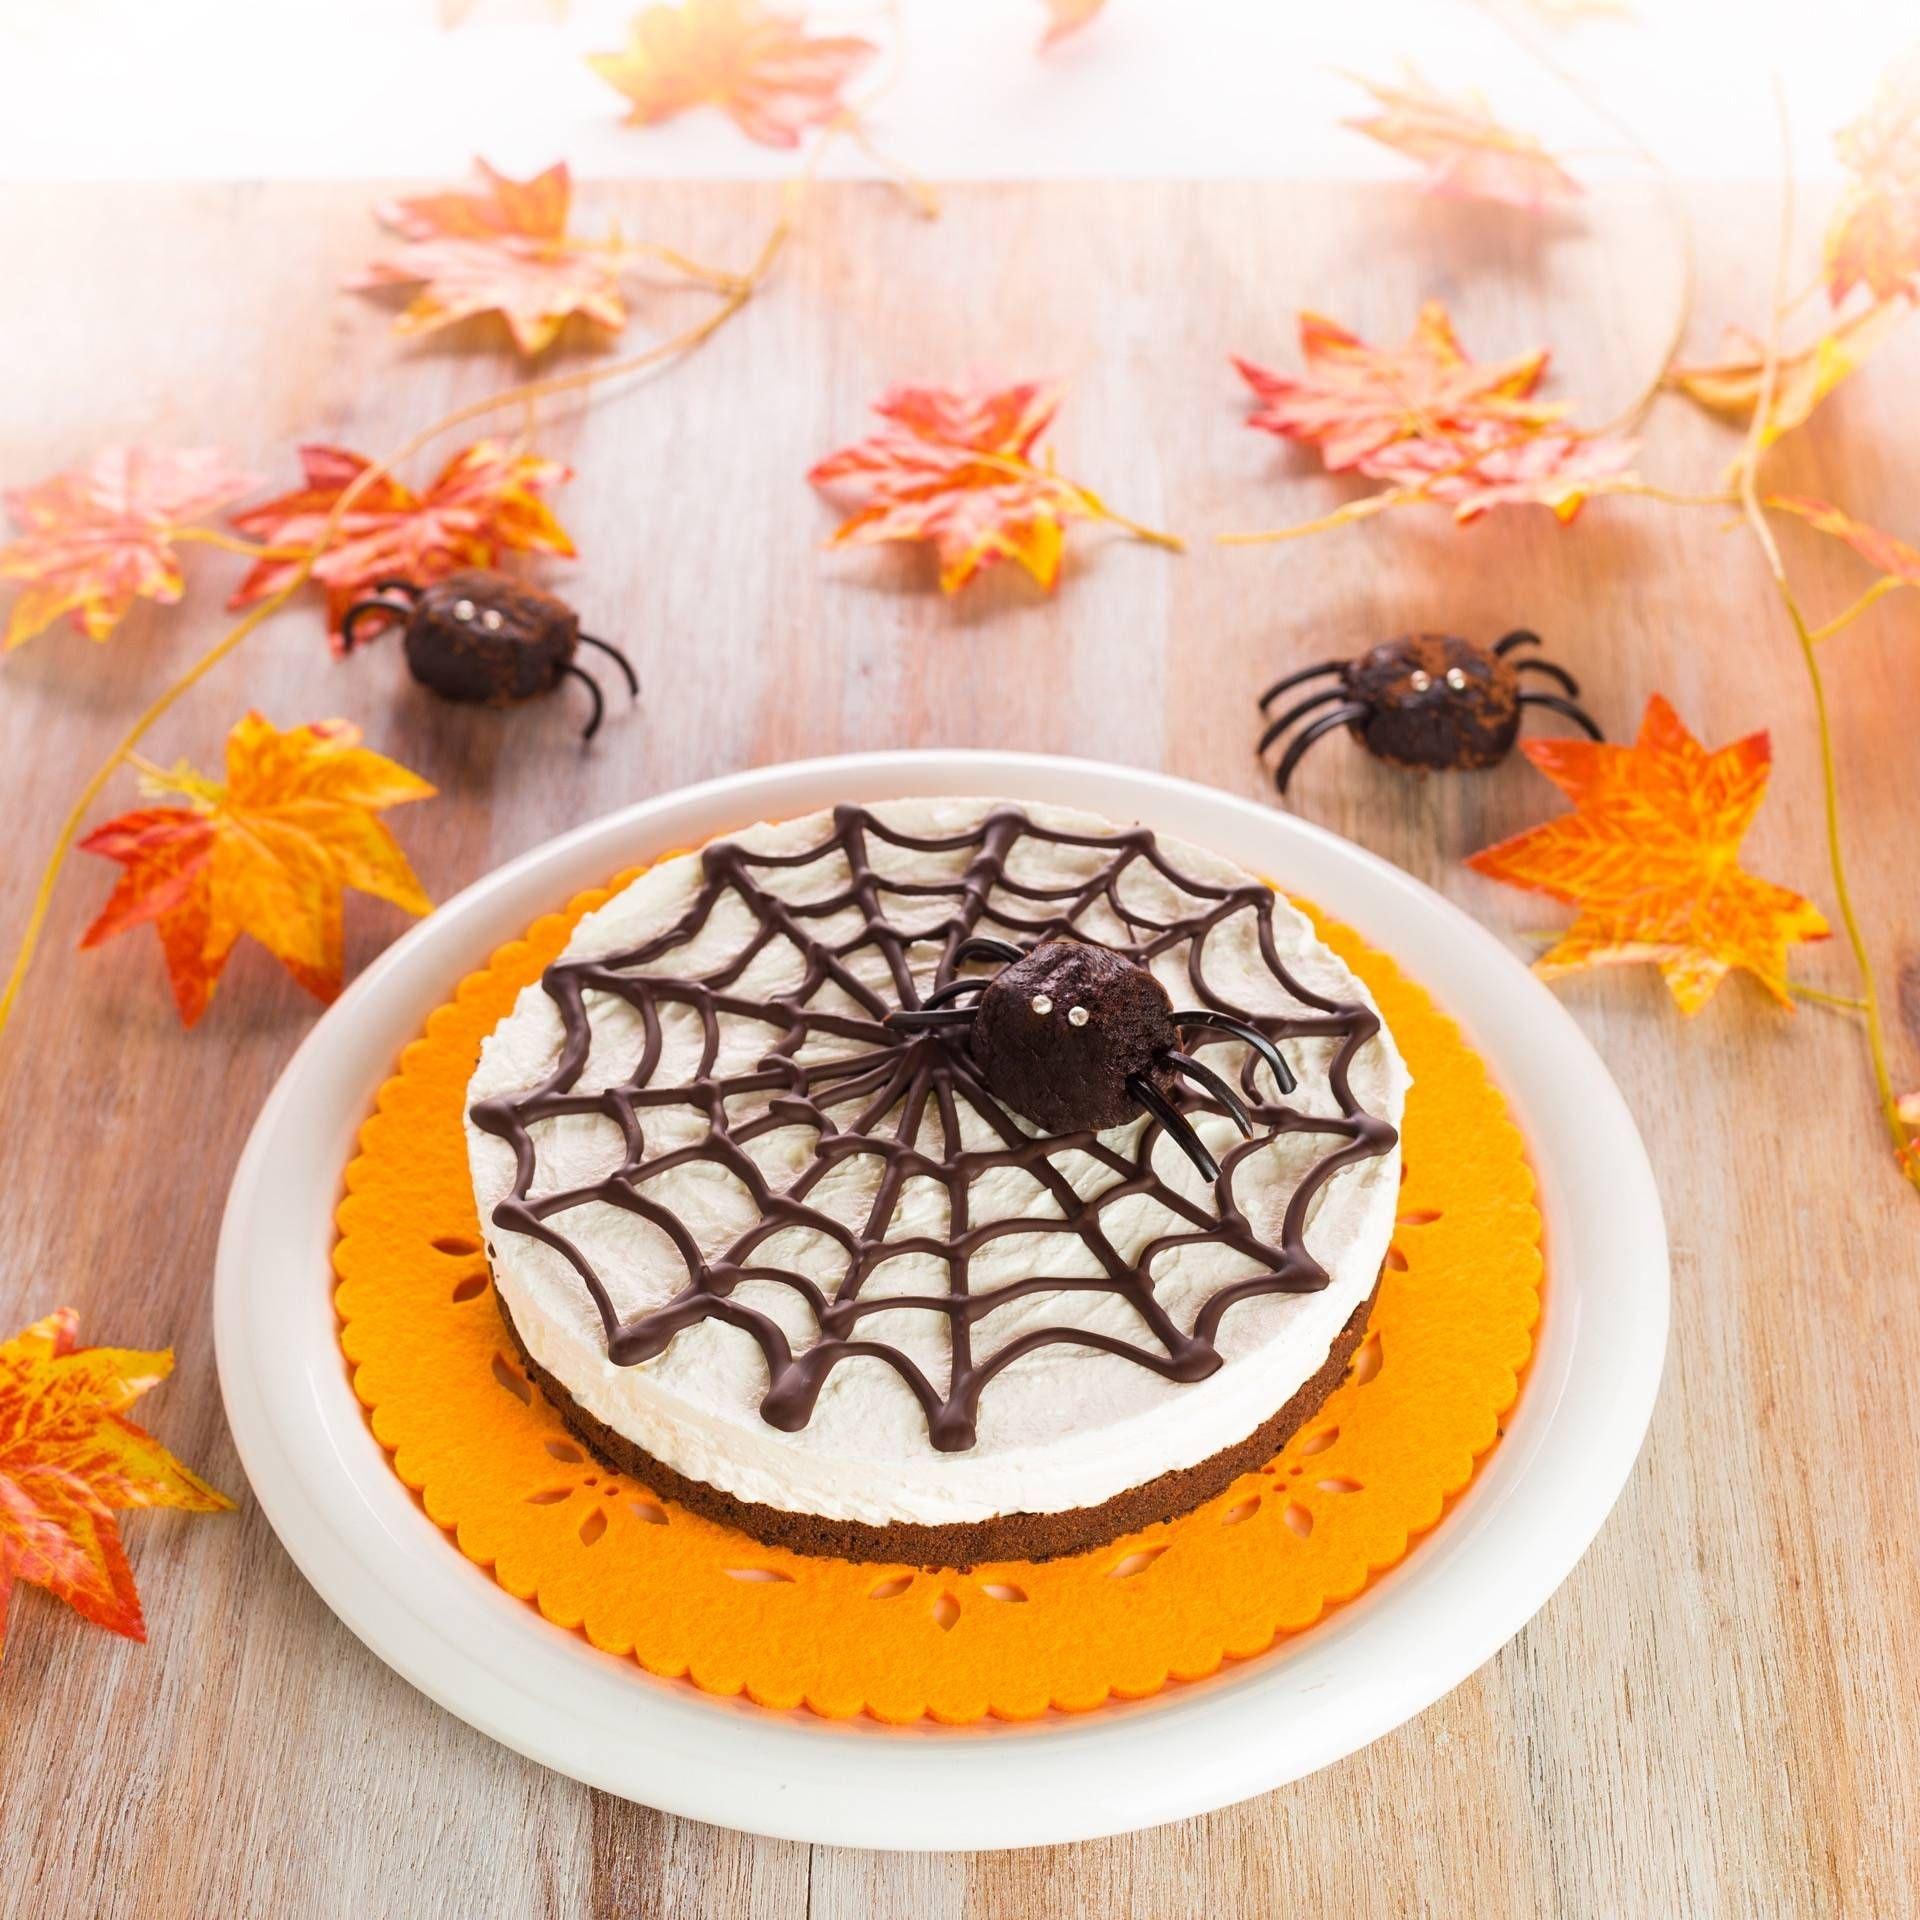 Torta ragnatela per Halloween - Parmalat